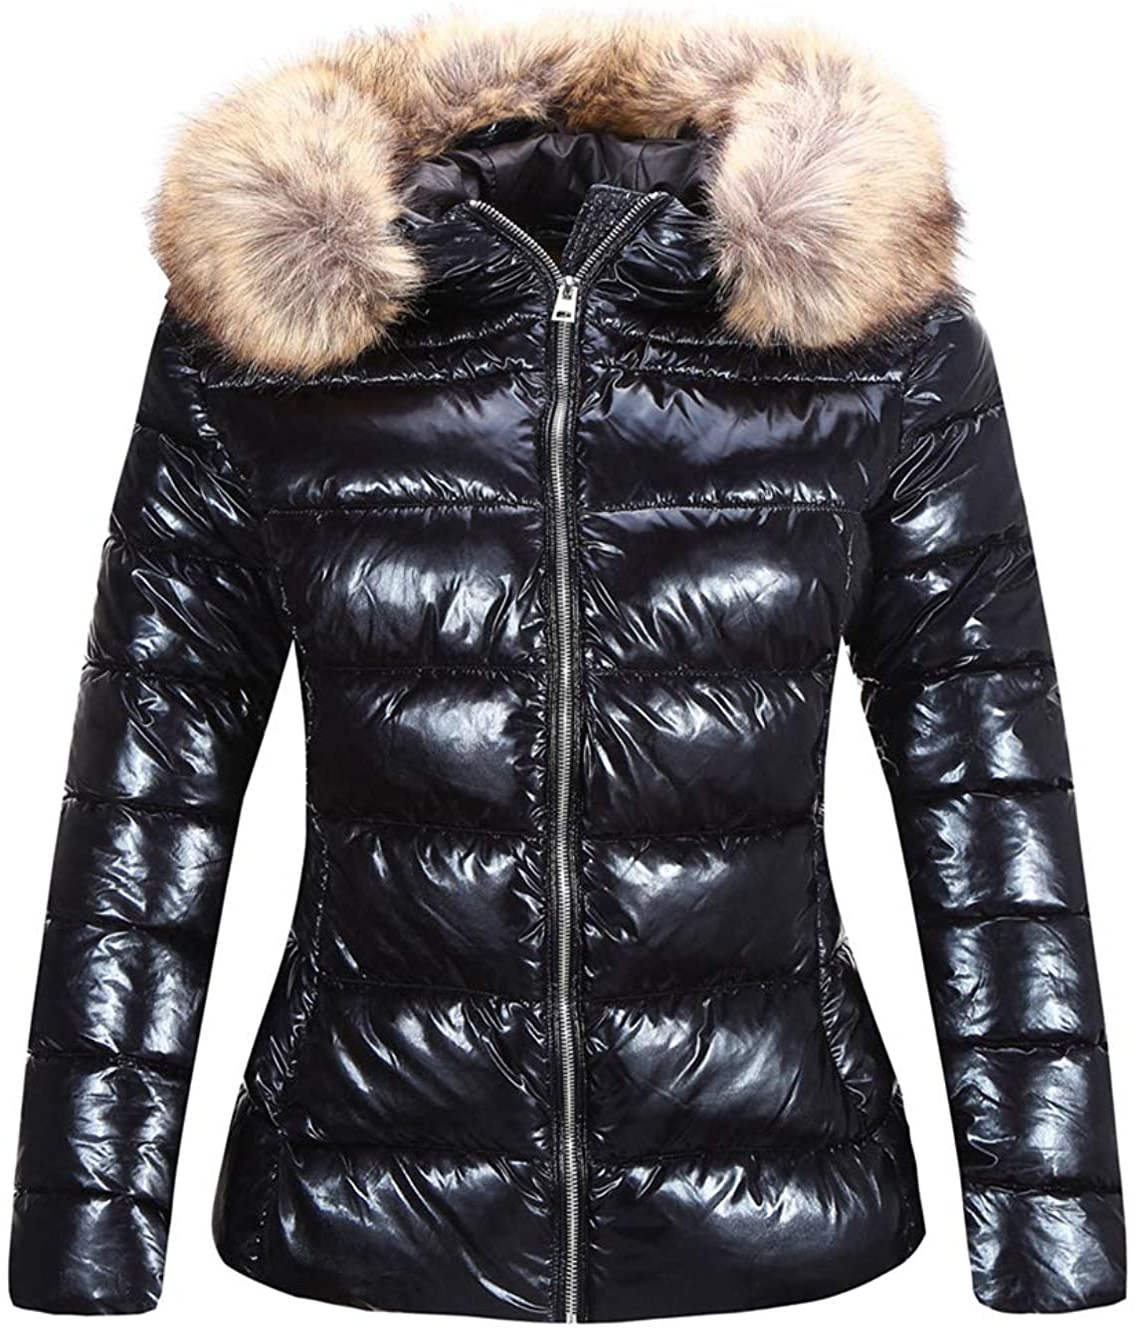 Bellivera Women's Lightweight Puffer Jacket Warm Coat Hooded with Fur Collar